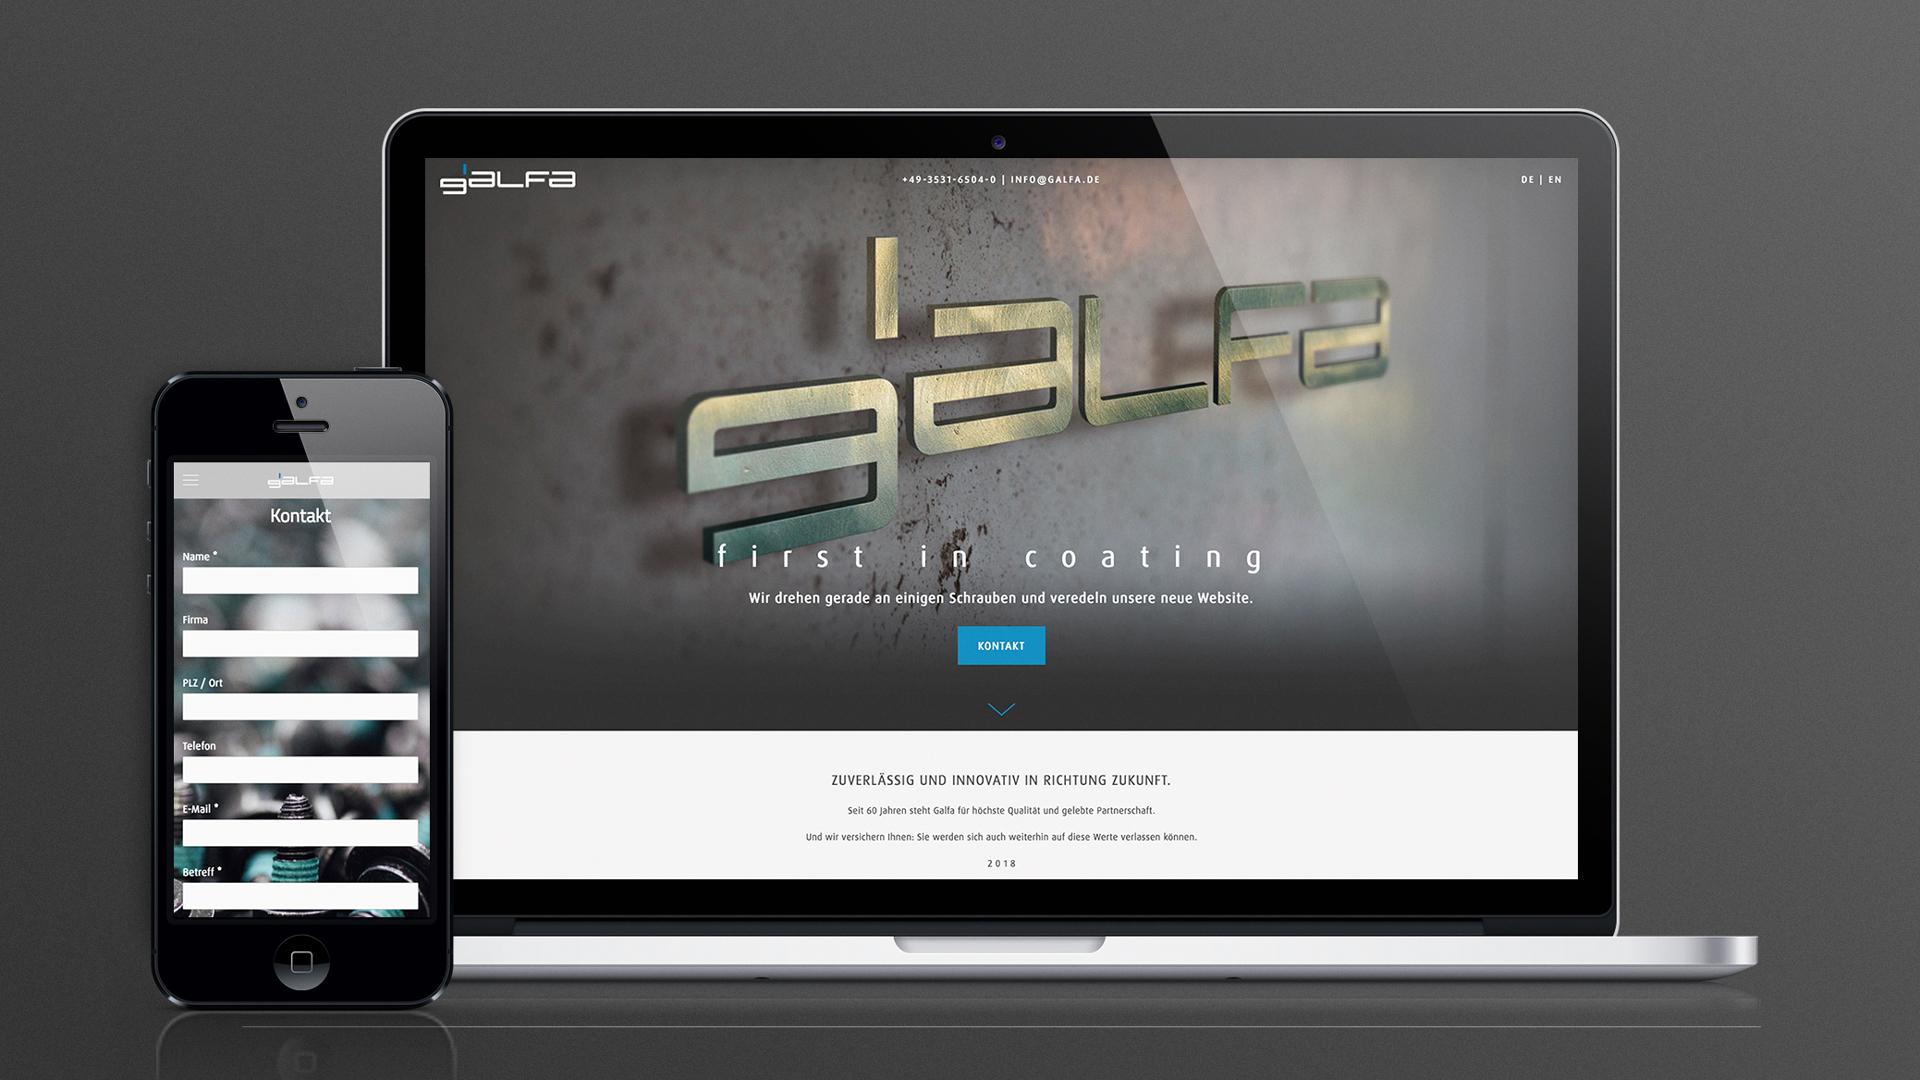 Galfa_Website.jpg